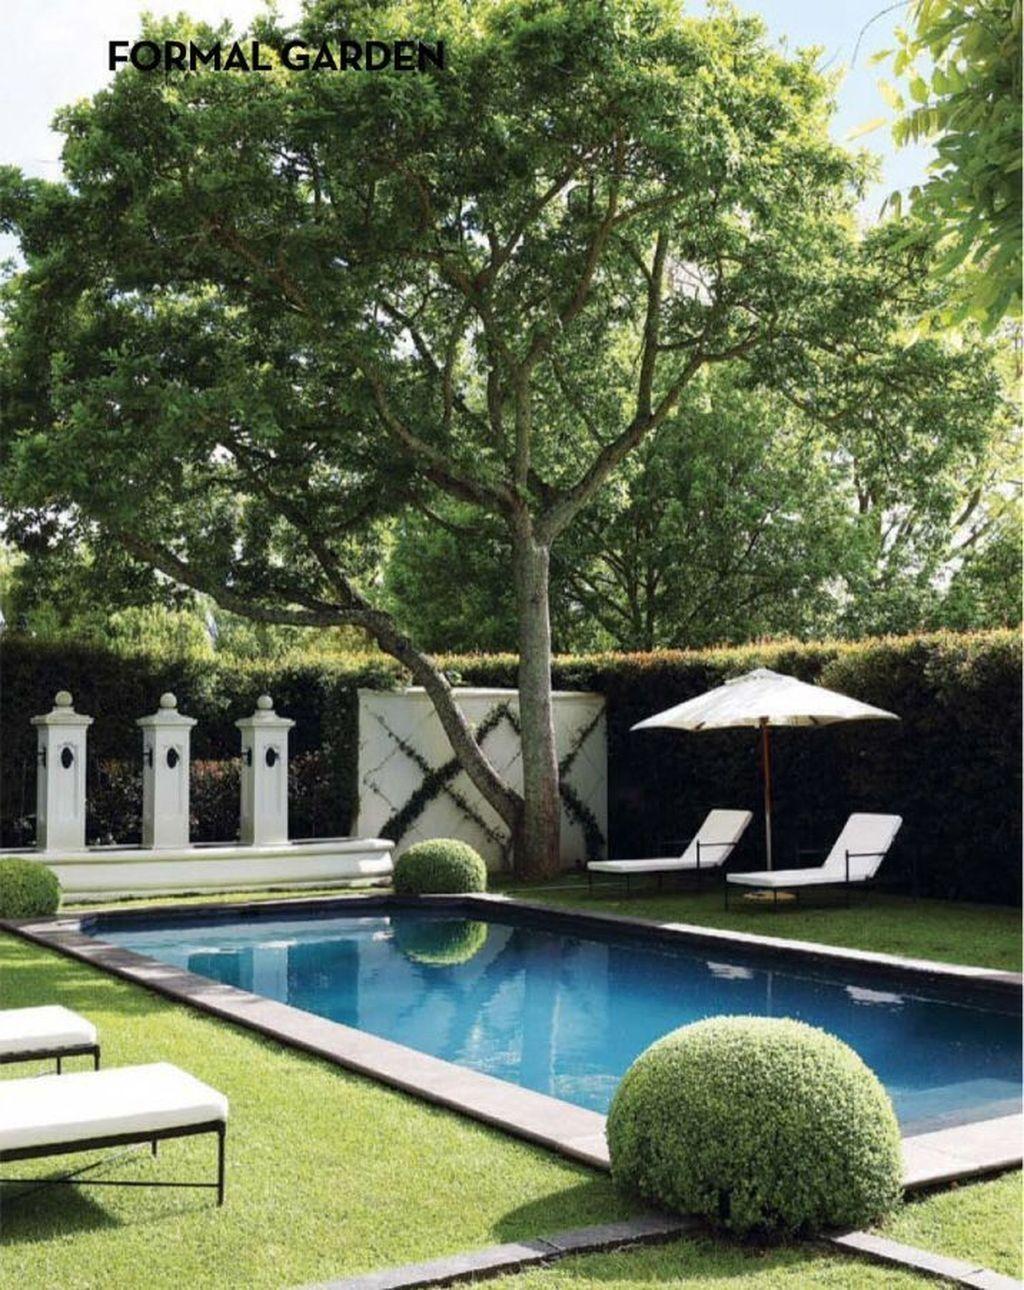 Swimming pool garden design  43 Cozy Swimming Pool Garden Design Ideas | Garden & Outdoor | Pinterest